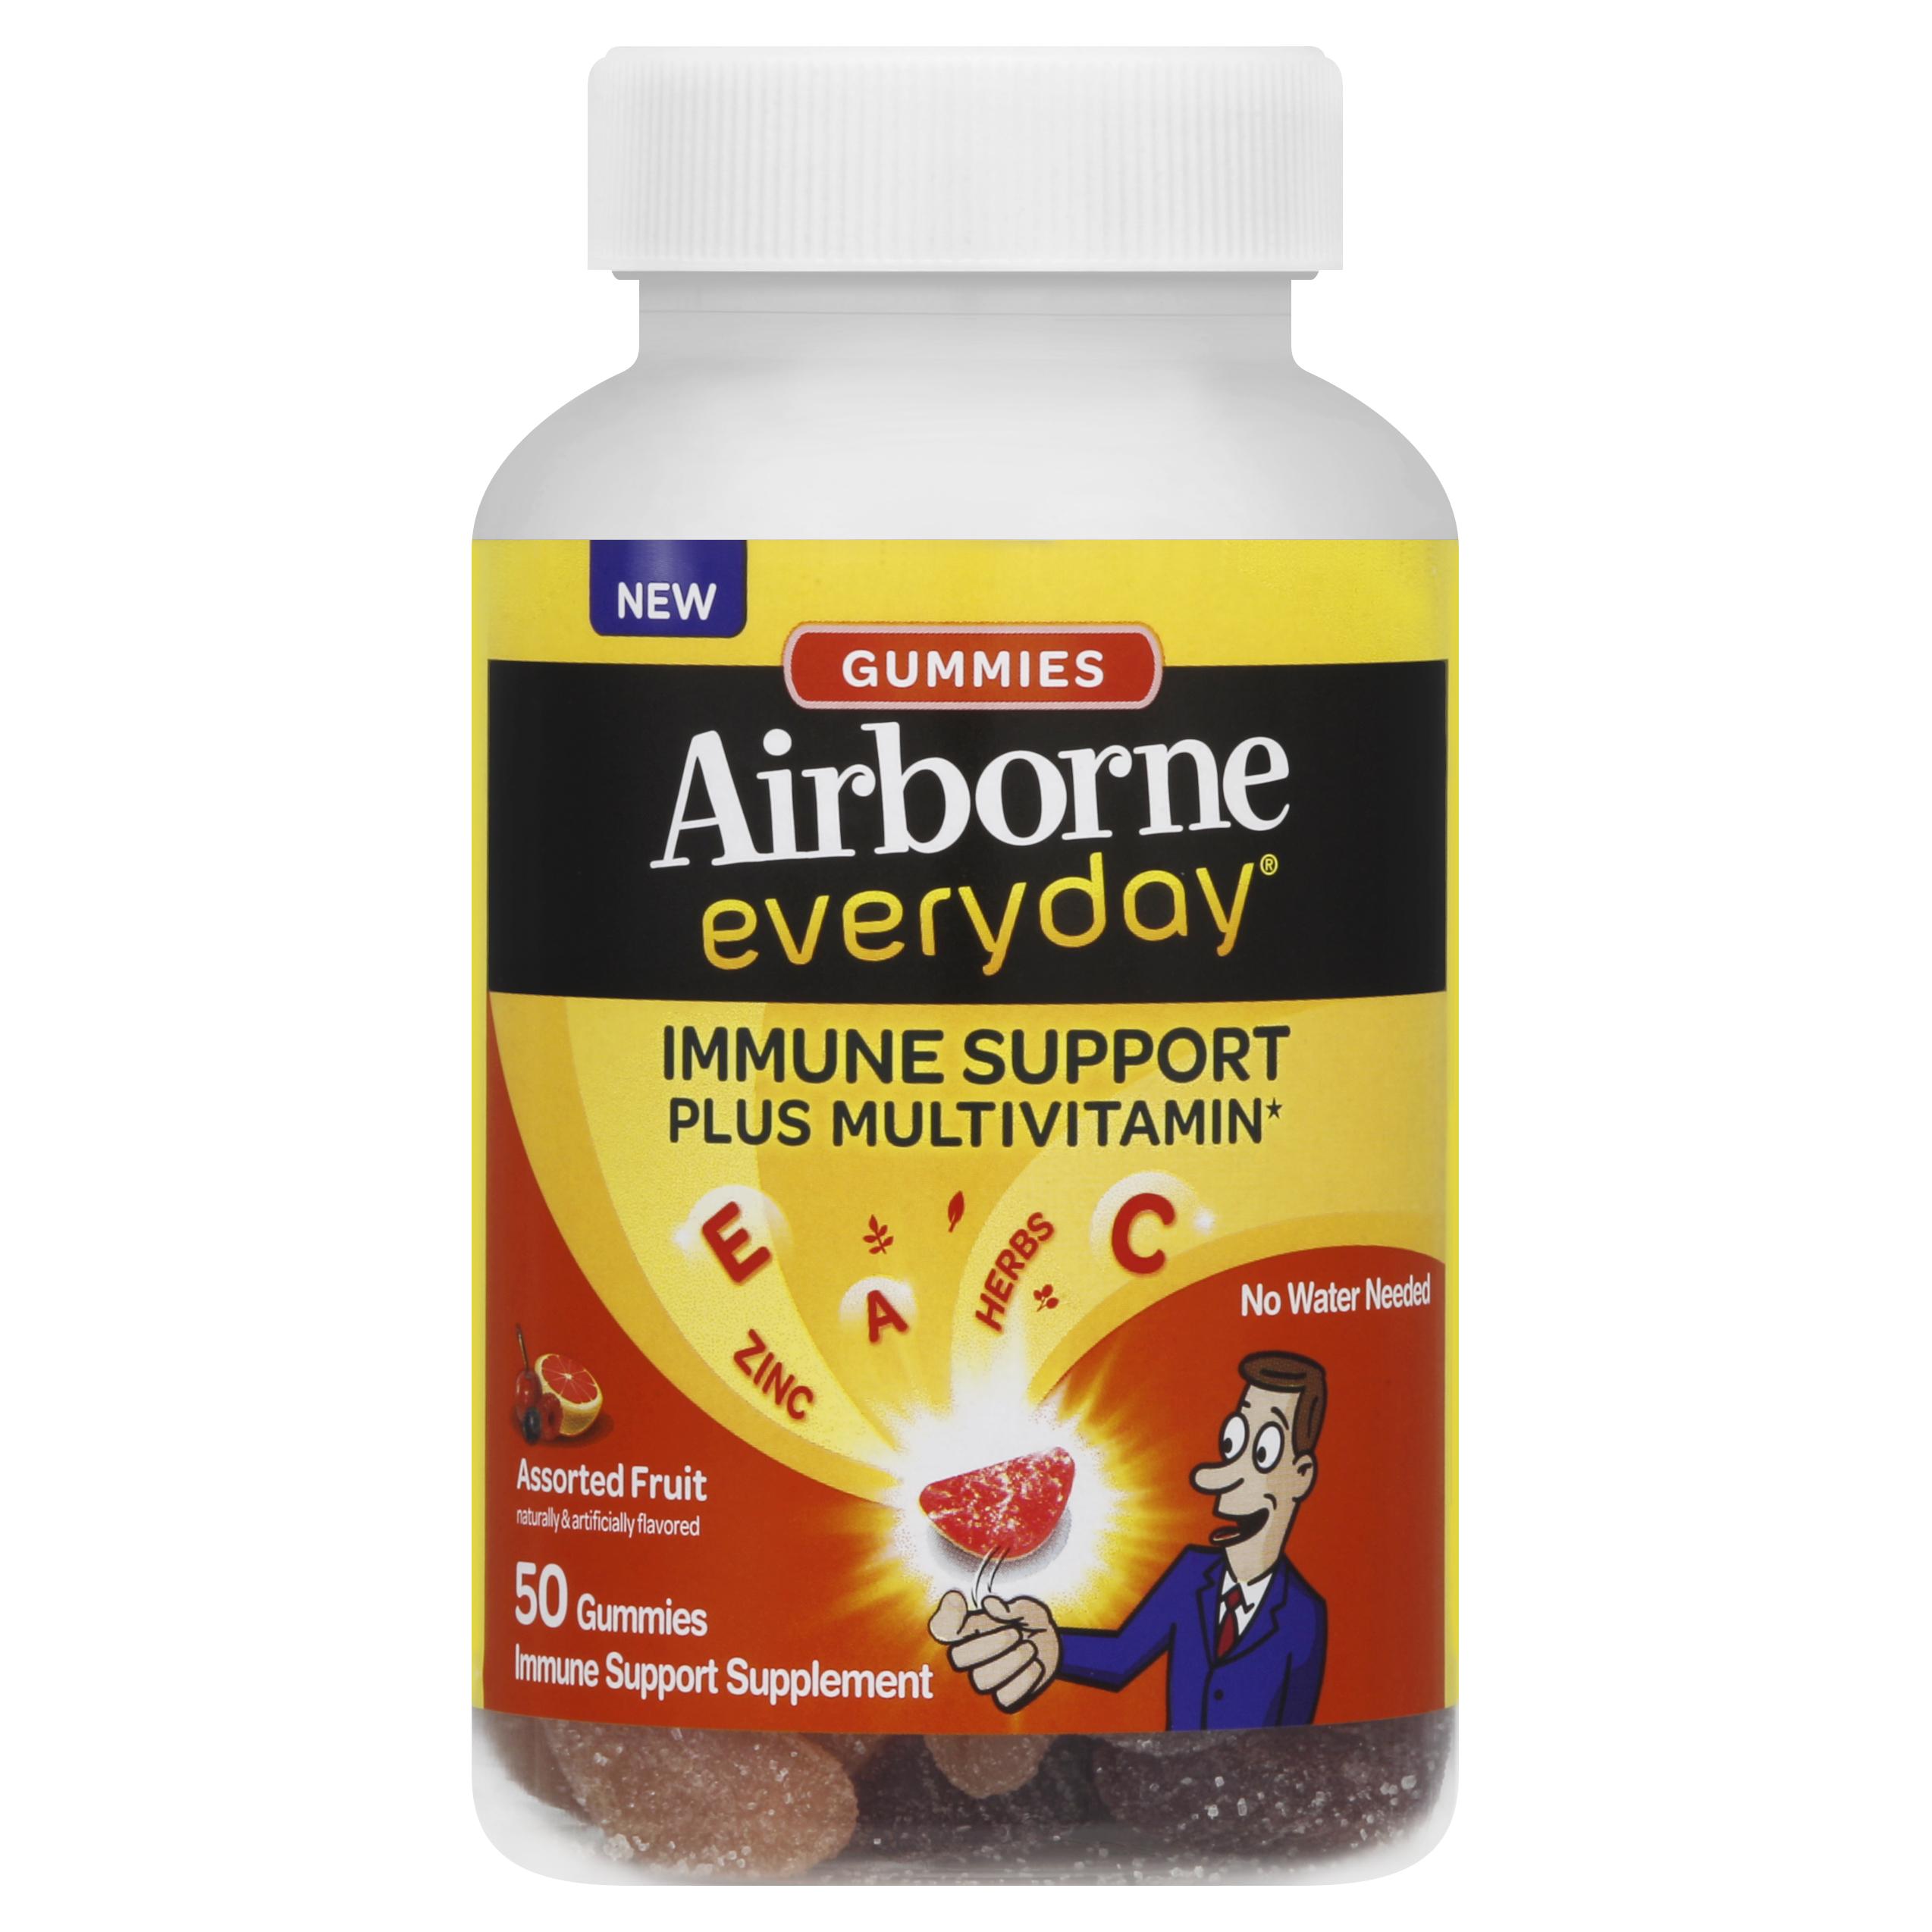 Airborne Everyday Vitamin C Immune Support Supplement and Multivitamin, Gummies, Assorted Fruit Flavor, 50 Count